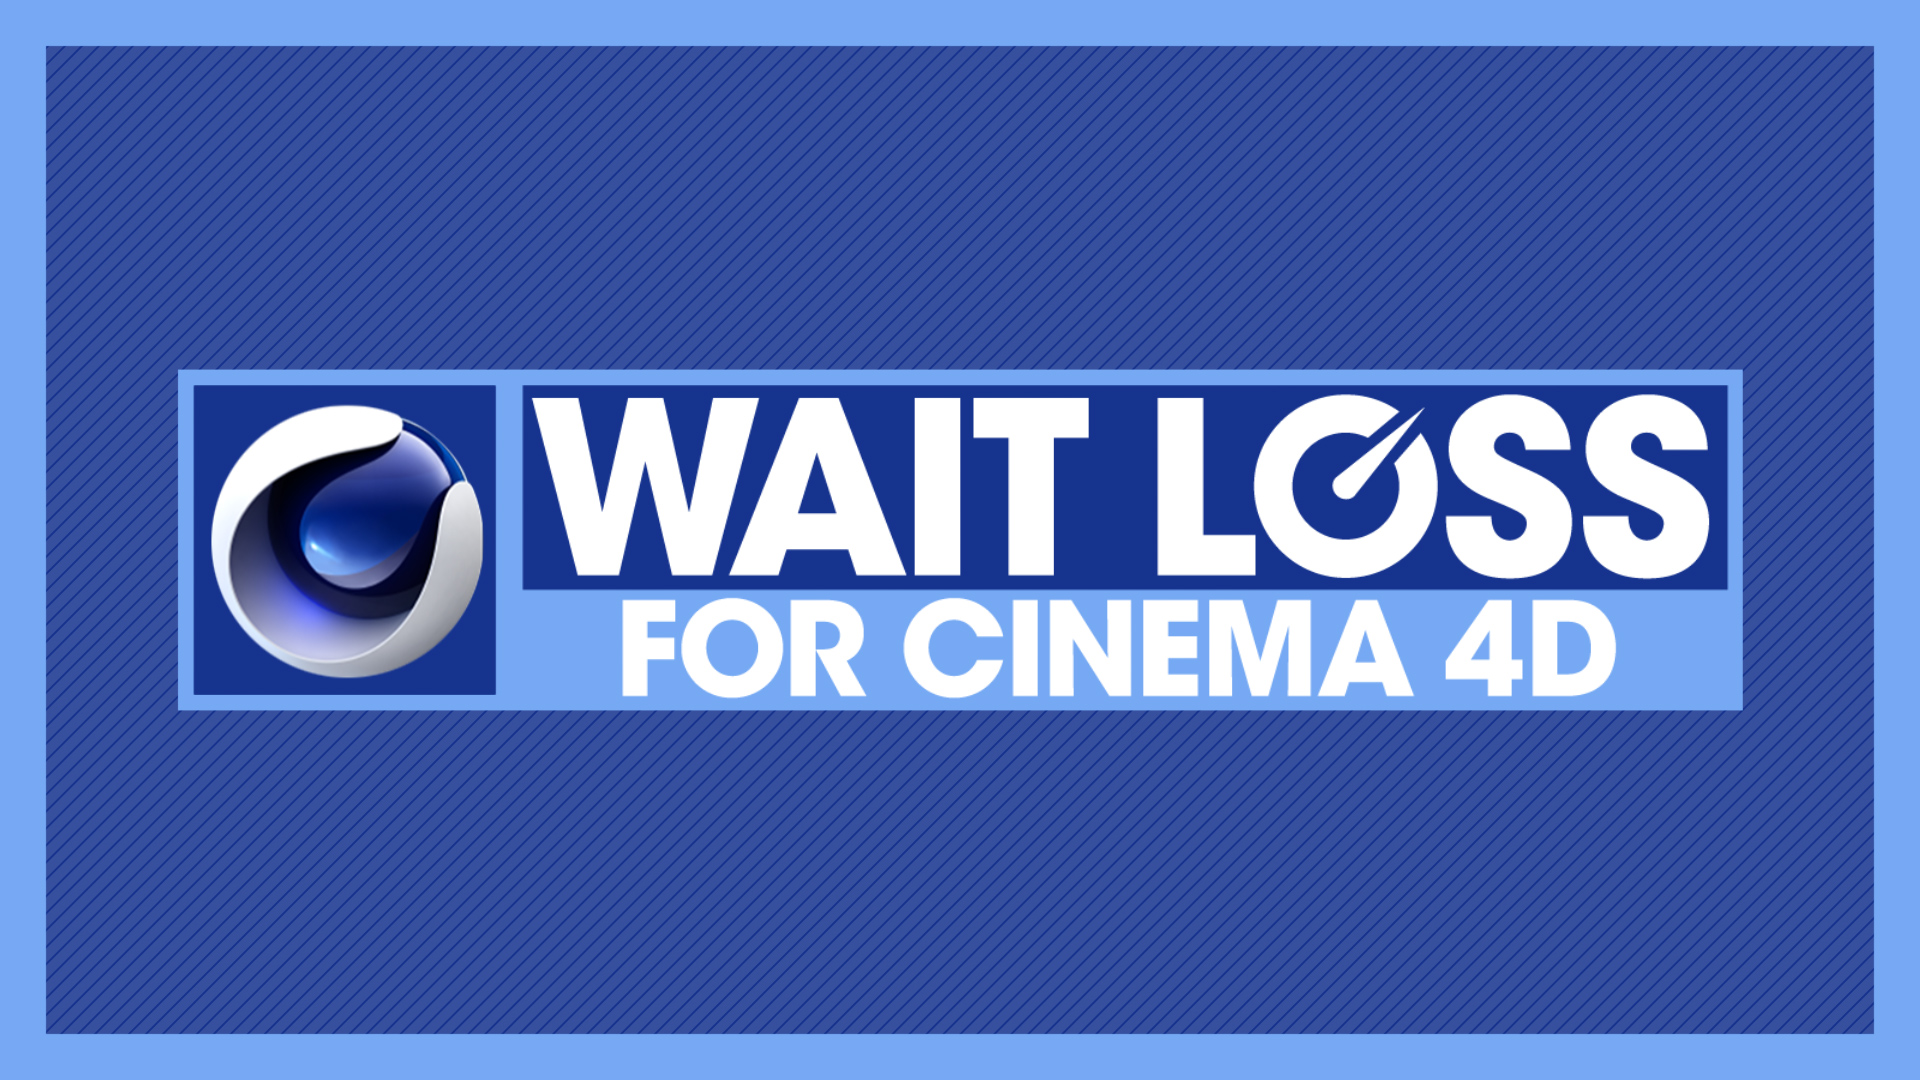 Wait Loss for Cinema 4D